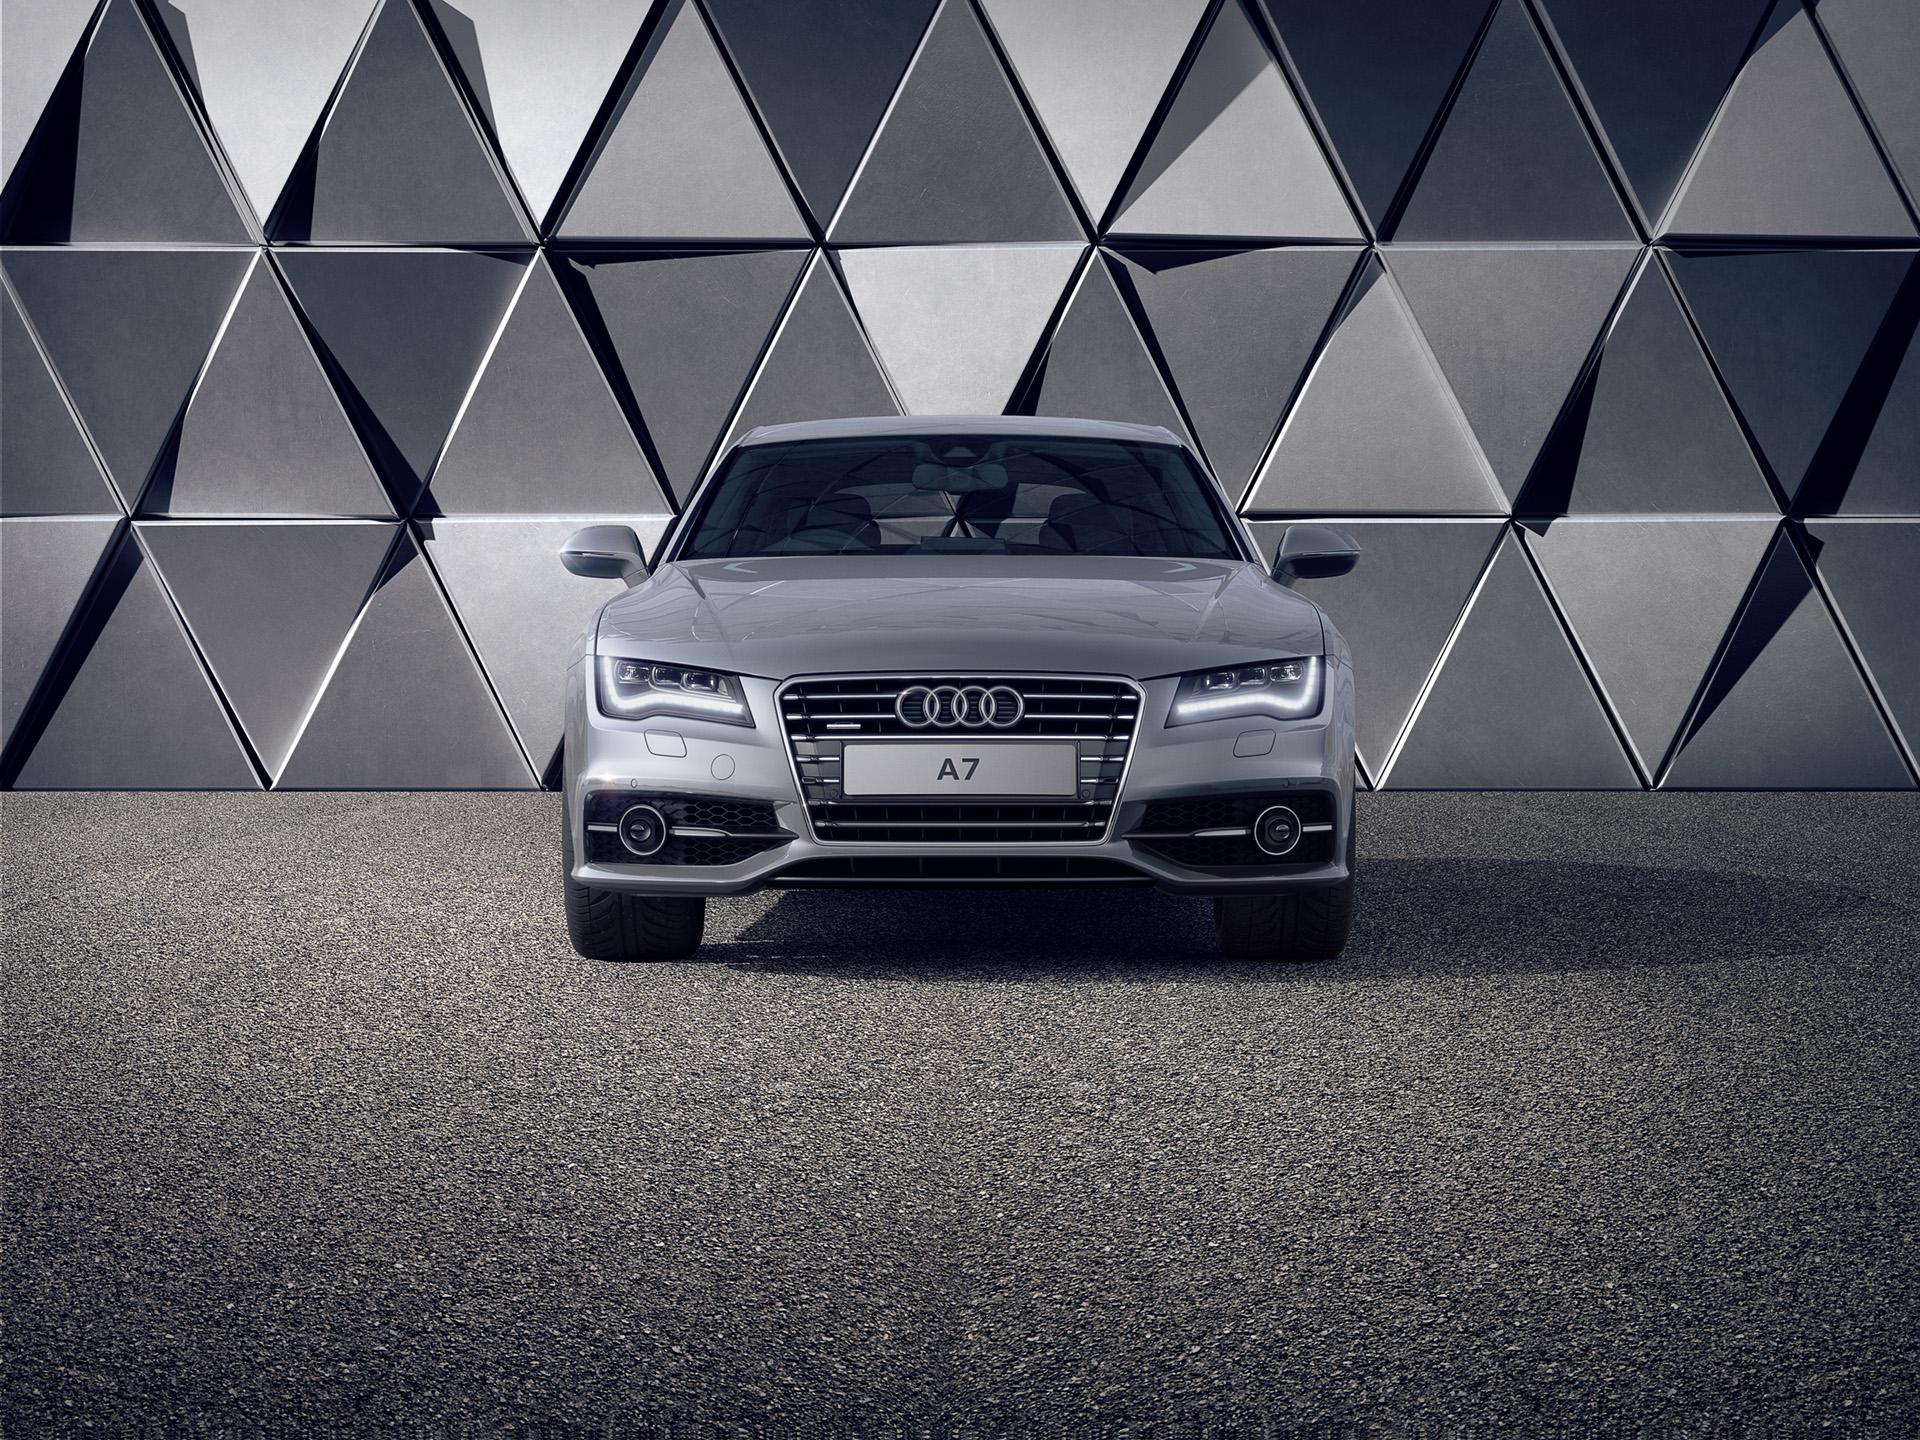 Audi_A7_Front.jpg